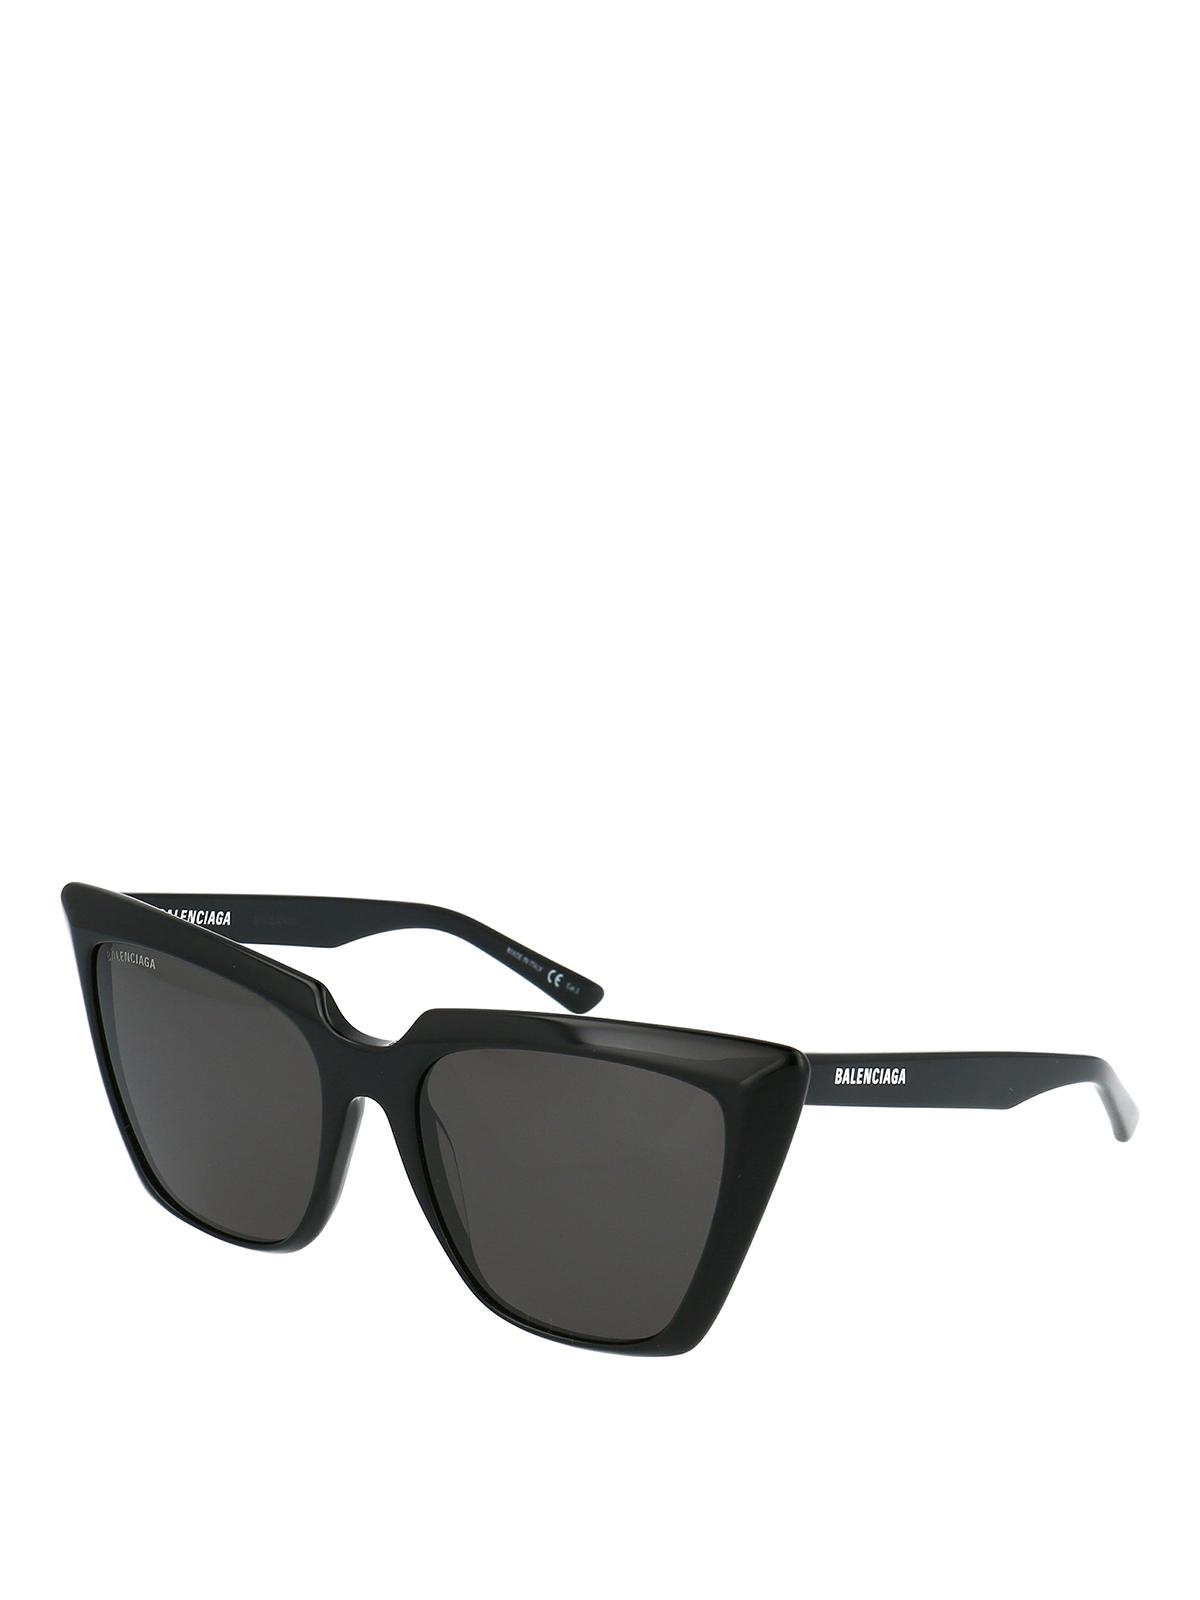 Balenciaga Black Squared Cat-Eye Sunglasses